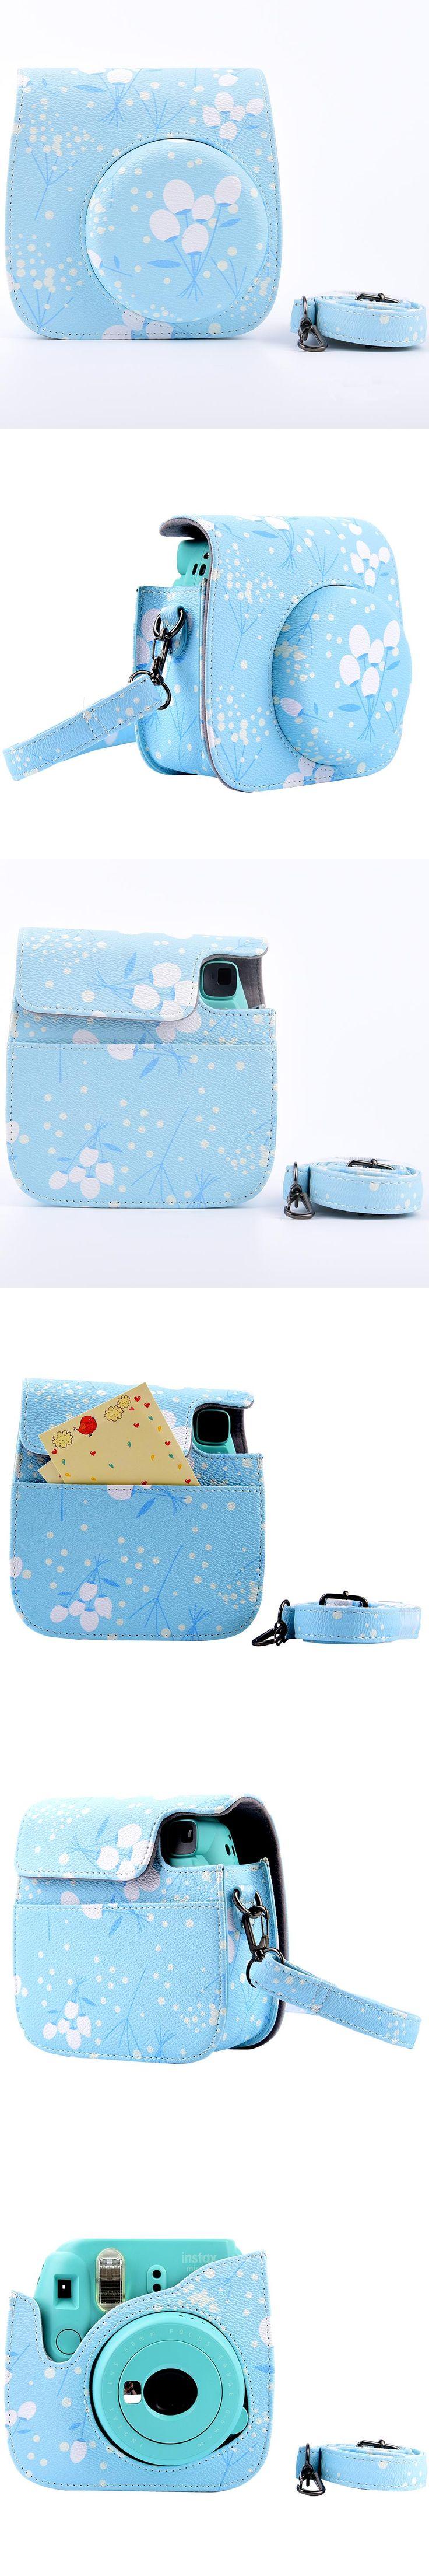 Lovely Flower Camera Bag Case with Shoulder Strap for Fujifilm Instax Mini 8/Mini 8s Fuji Film Camera Pantone Blue